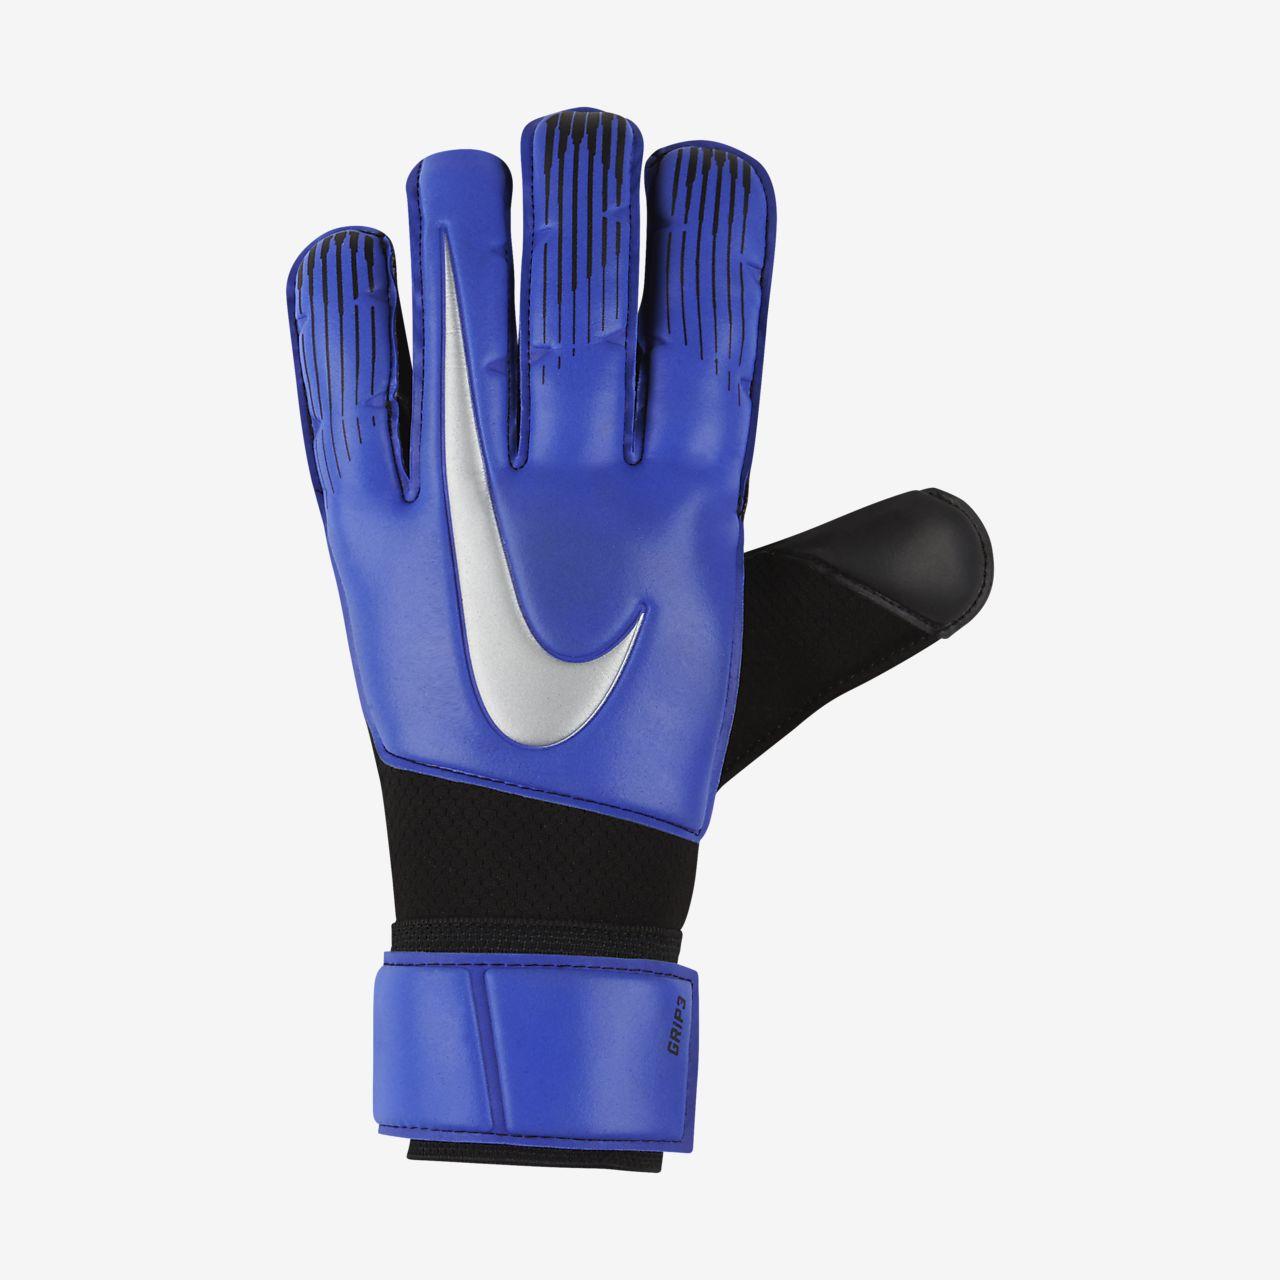 Nike Grip3 Goalkeeper Football Gloves